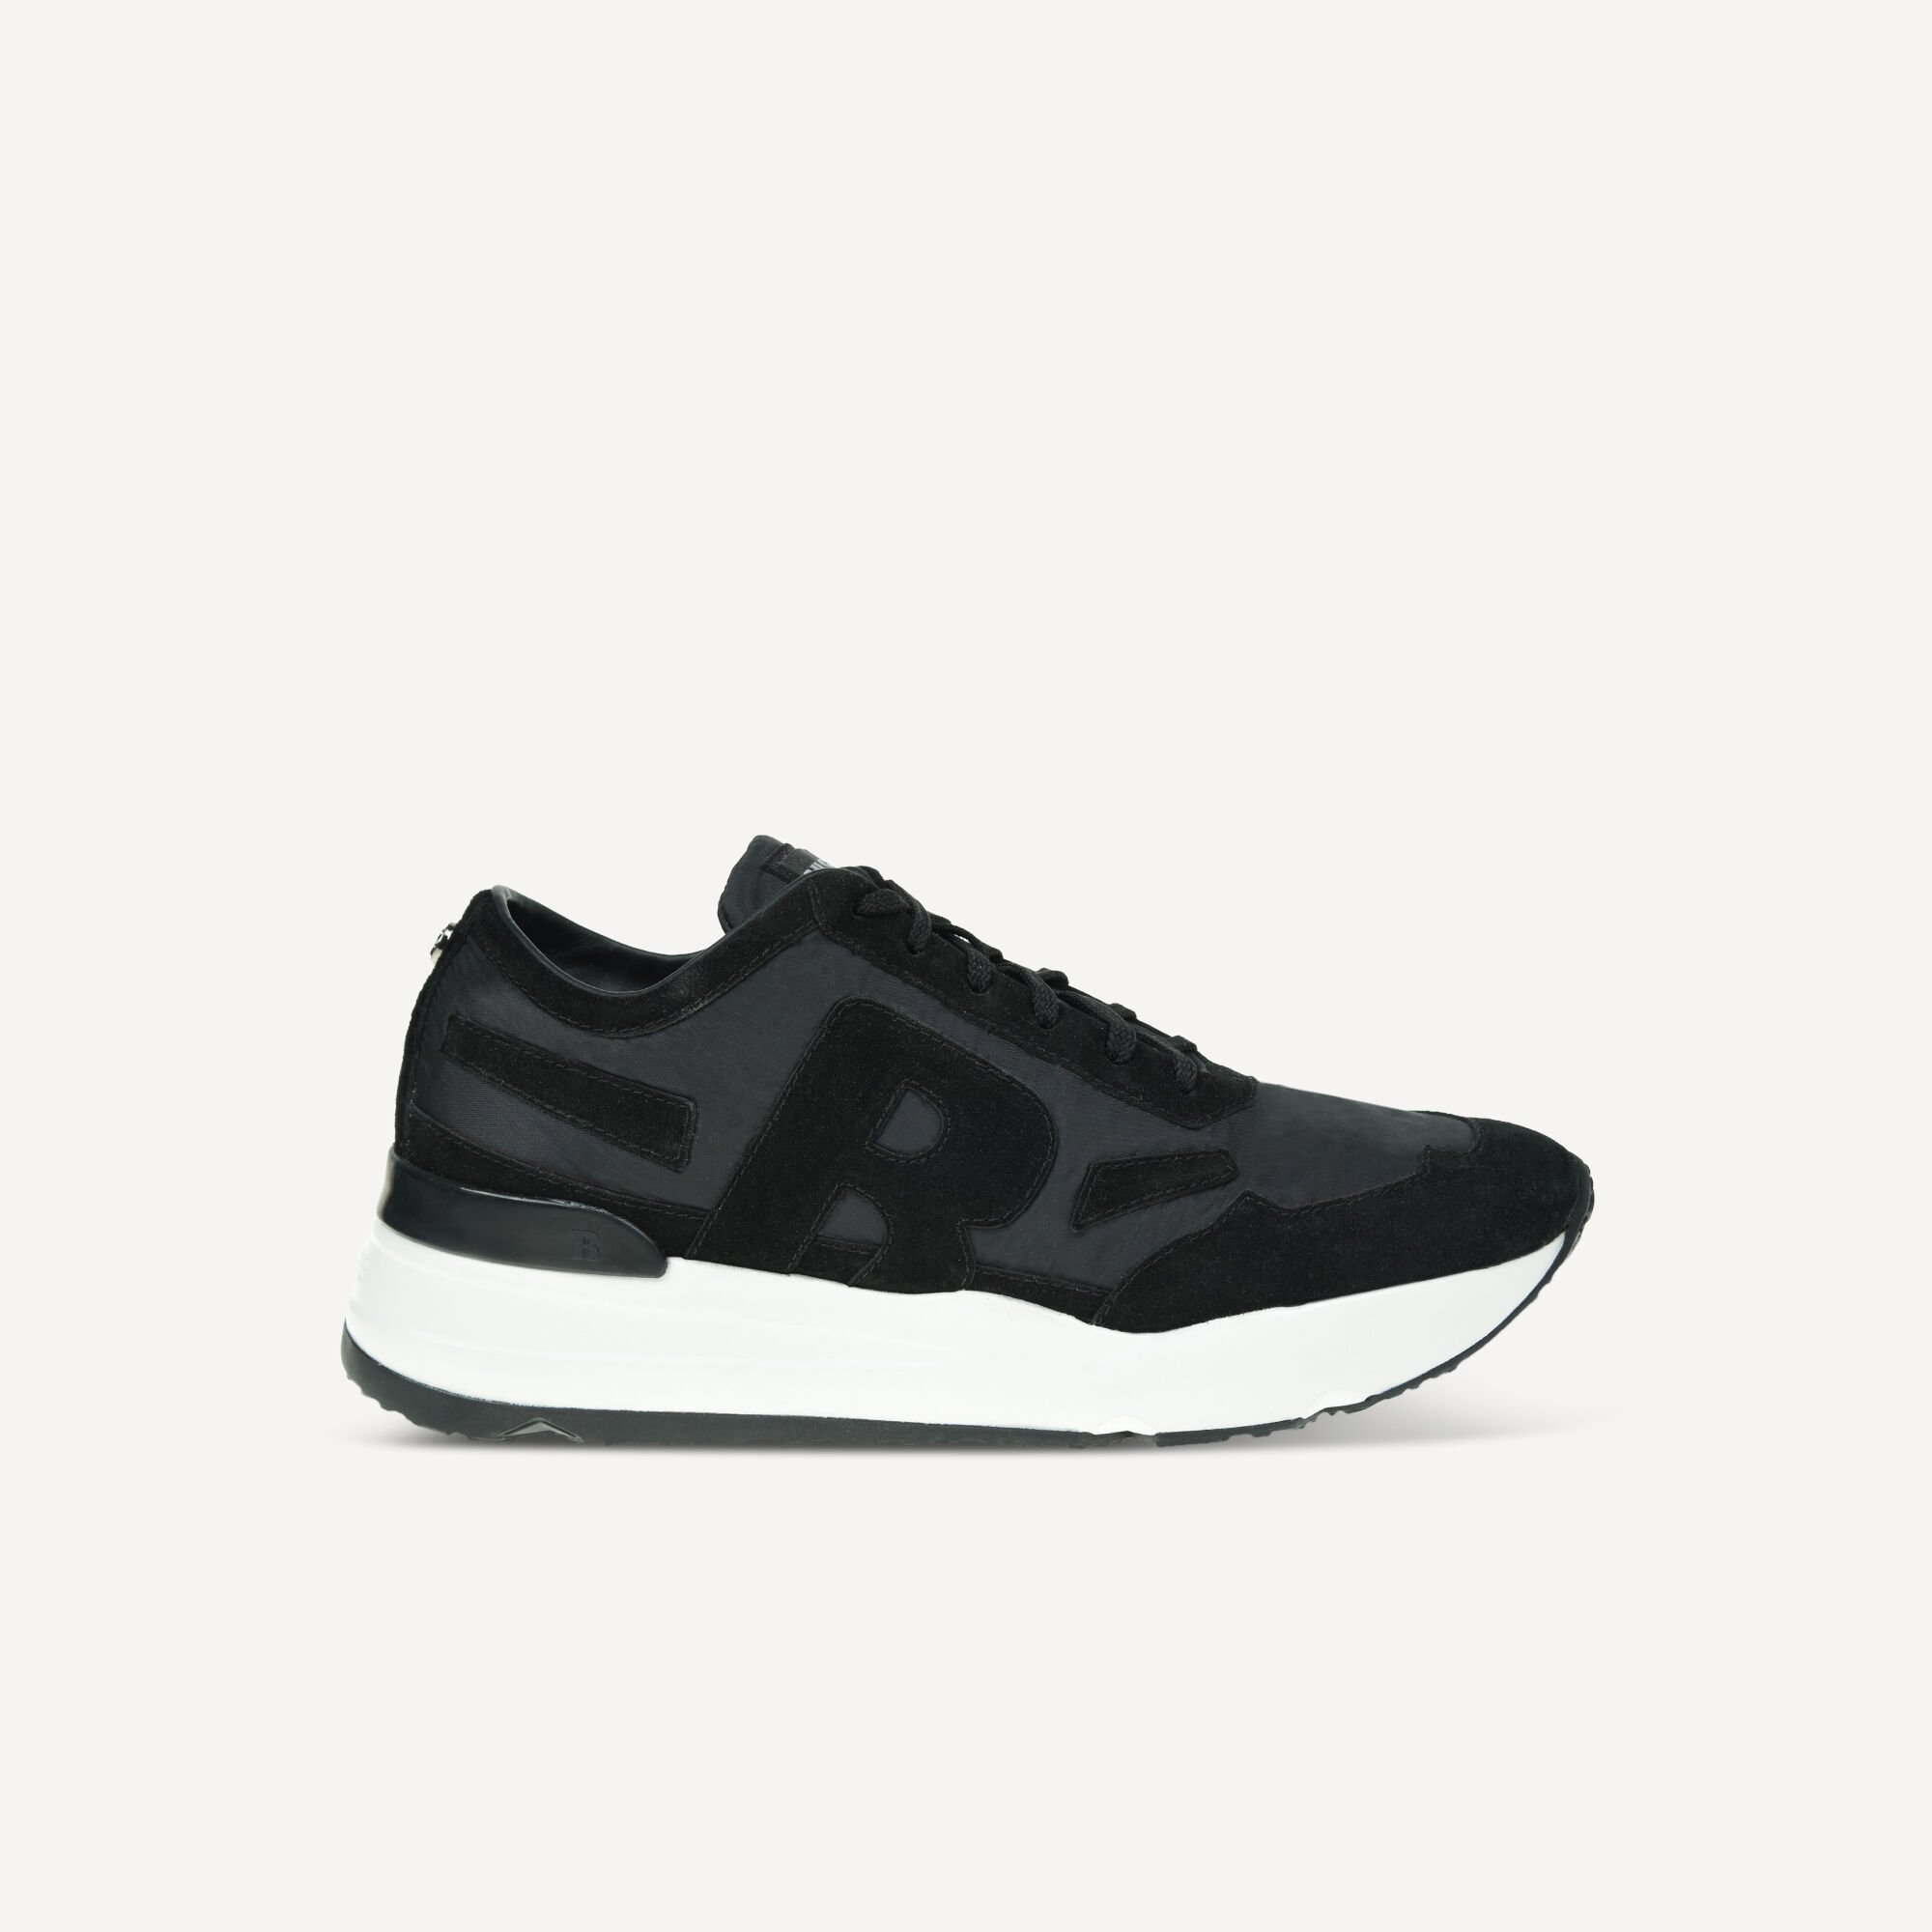 Ruco Line Fenzy sneakers gpydkEA